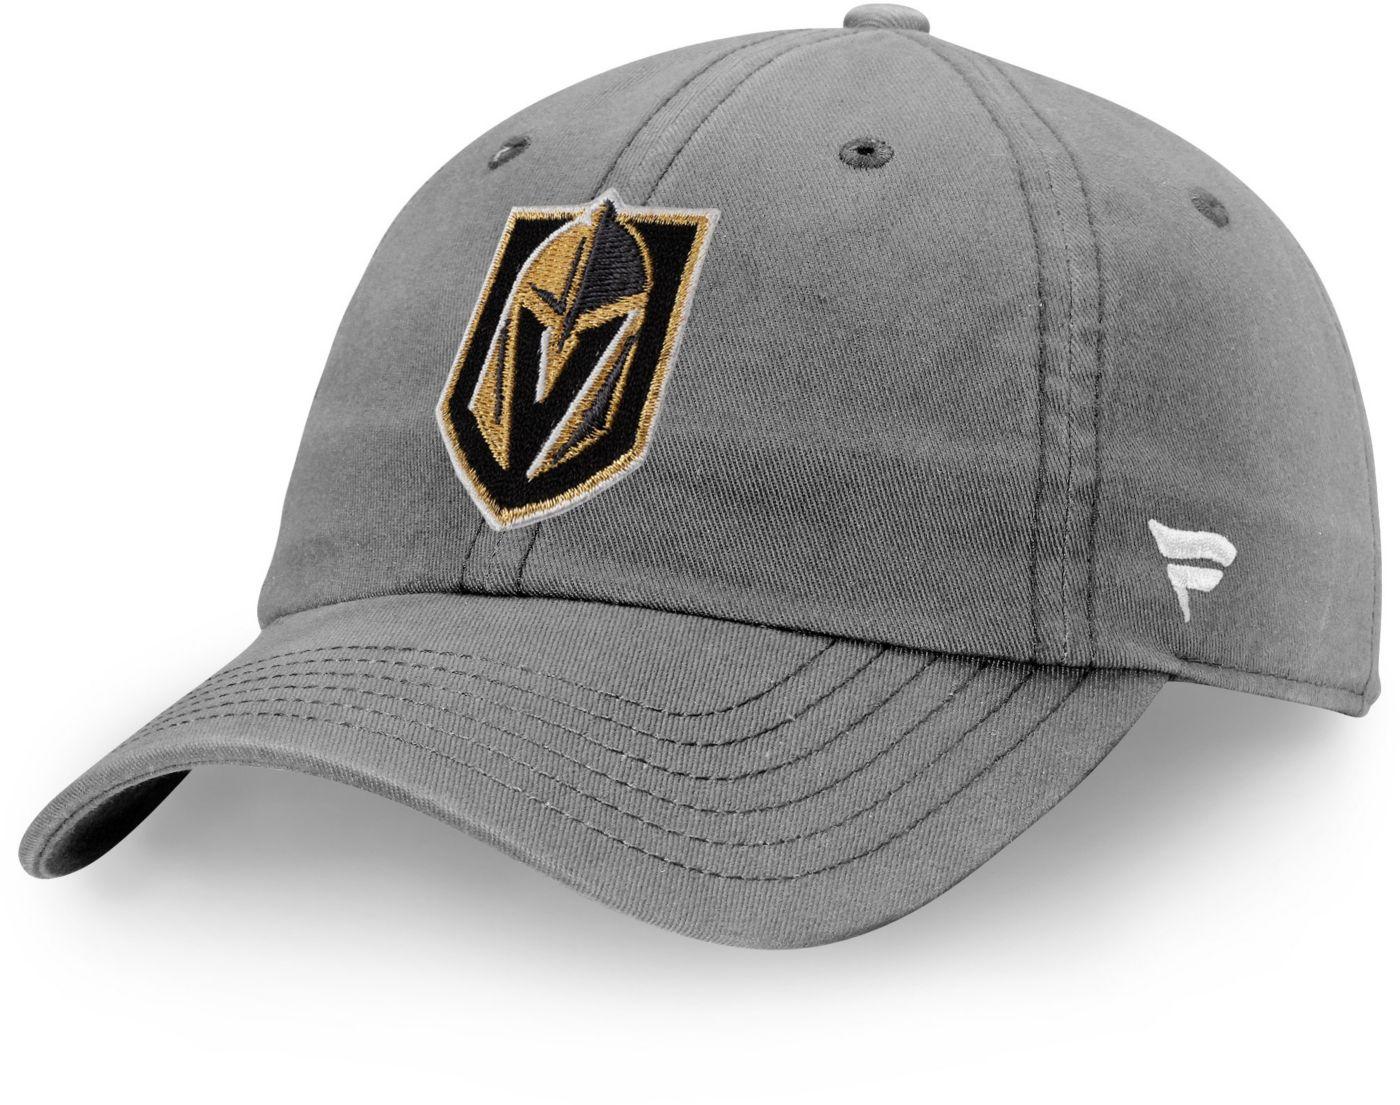 NHL Men's Vegas Golden Knights Primary Logo Grey Snapback Adjustable Hat